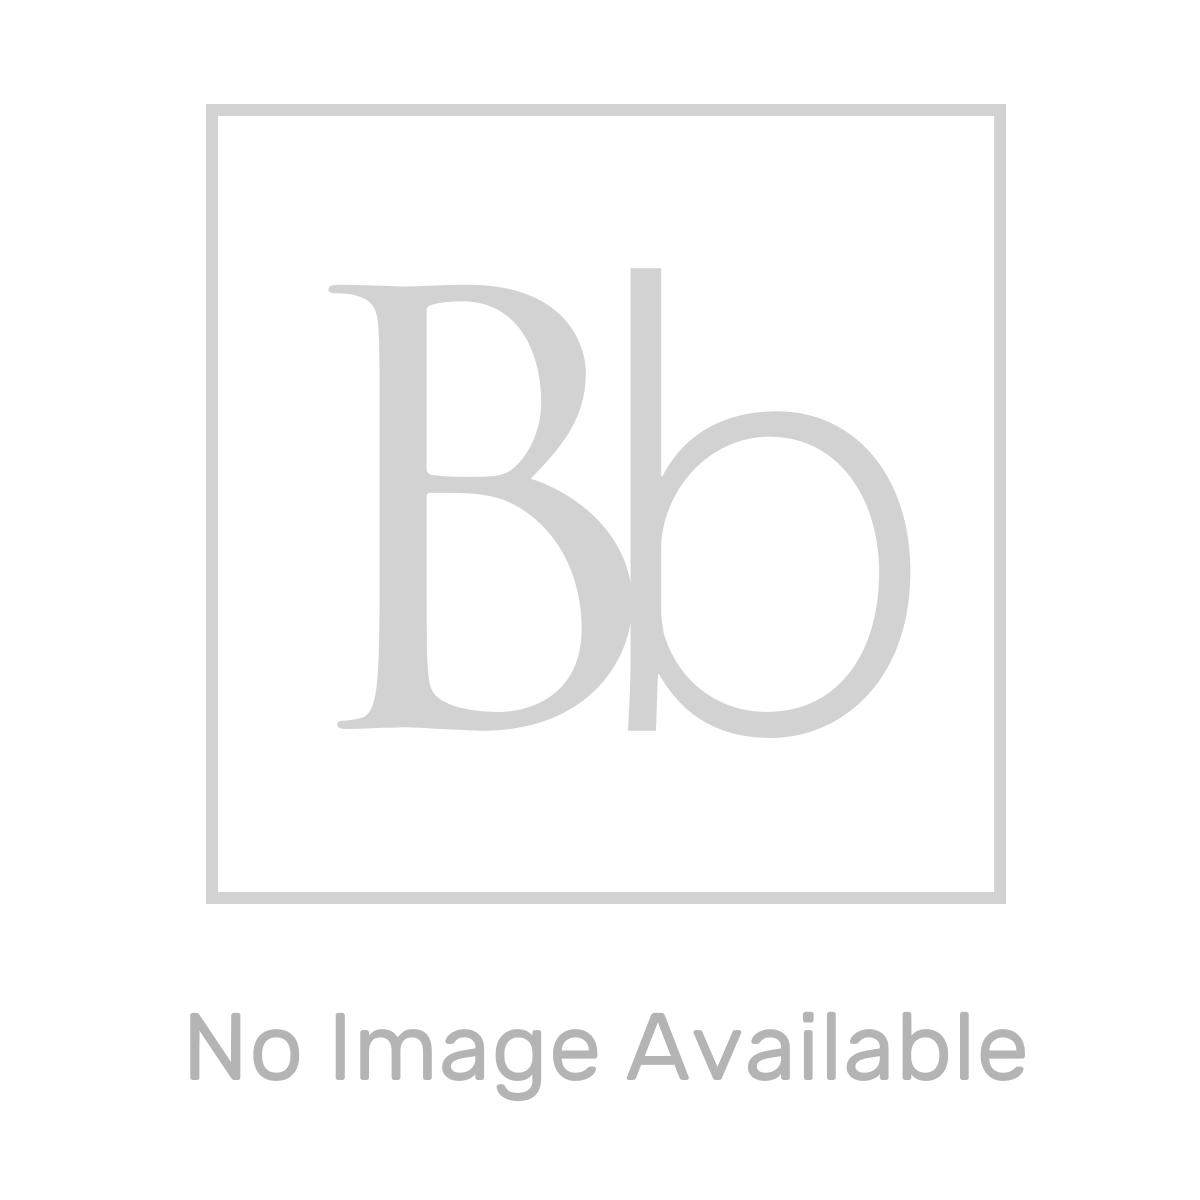 Stuart Turner 46429 Showermate Standard Single 2.6 Bar Pump Right